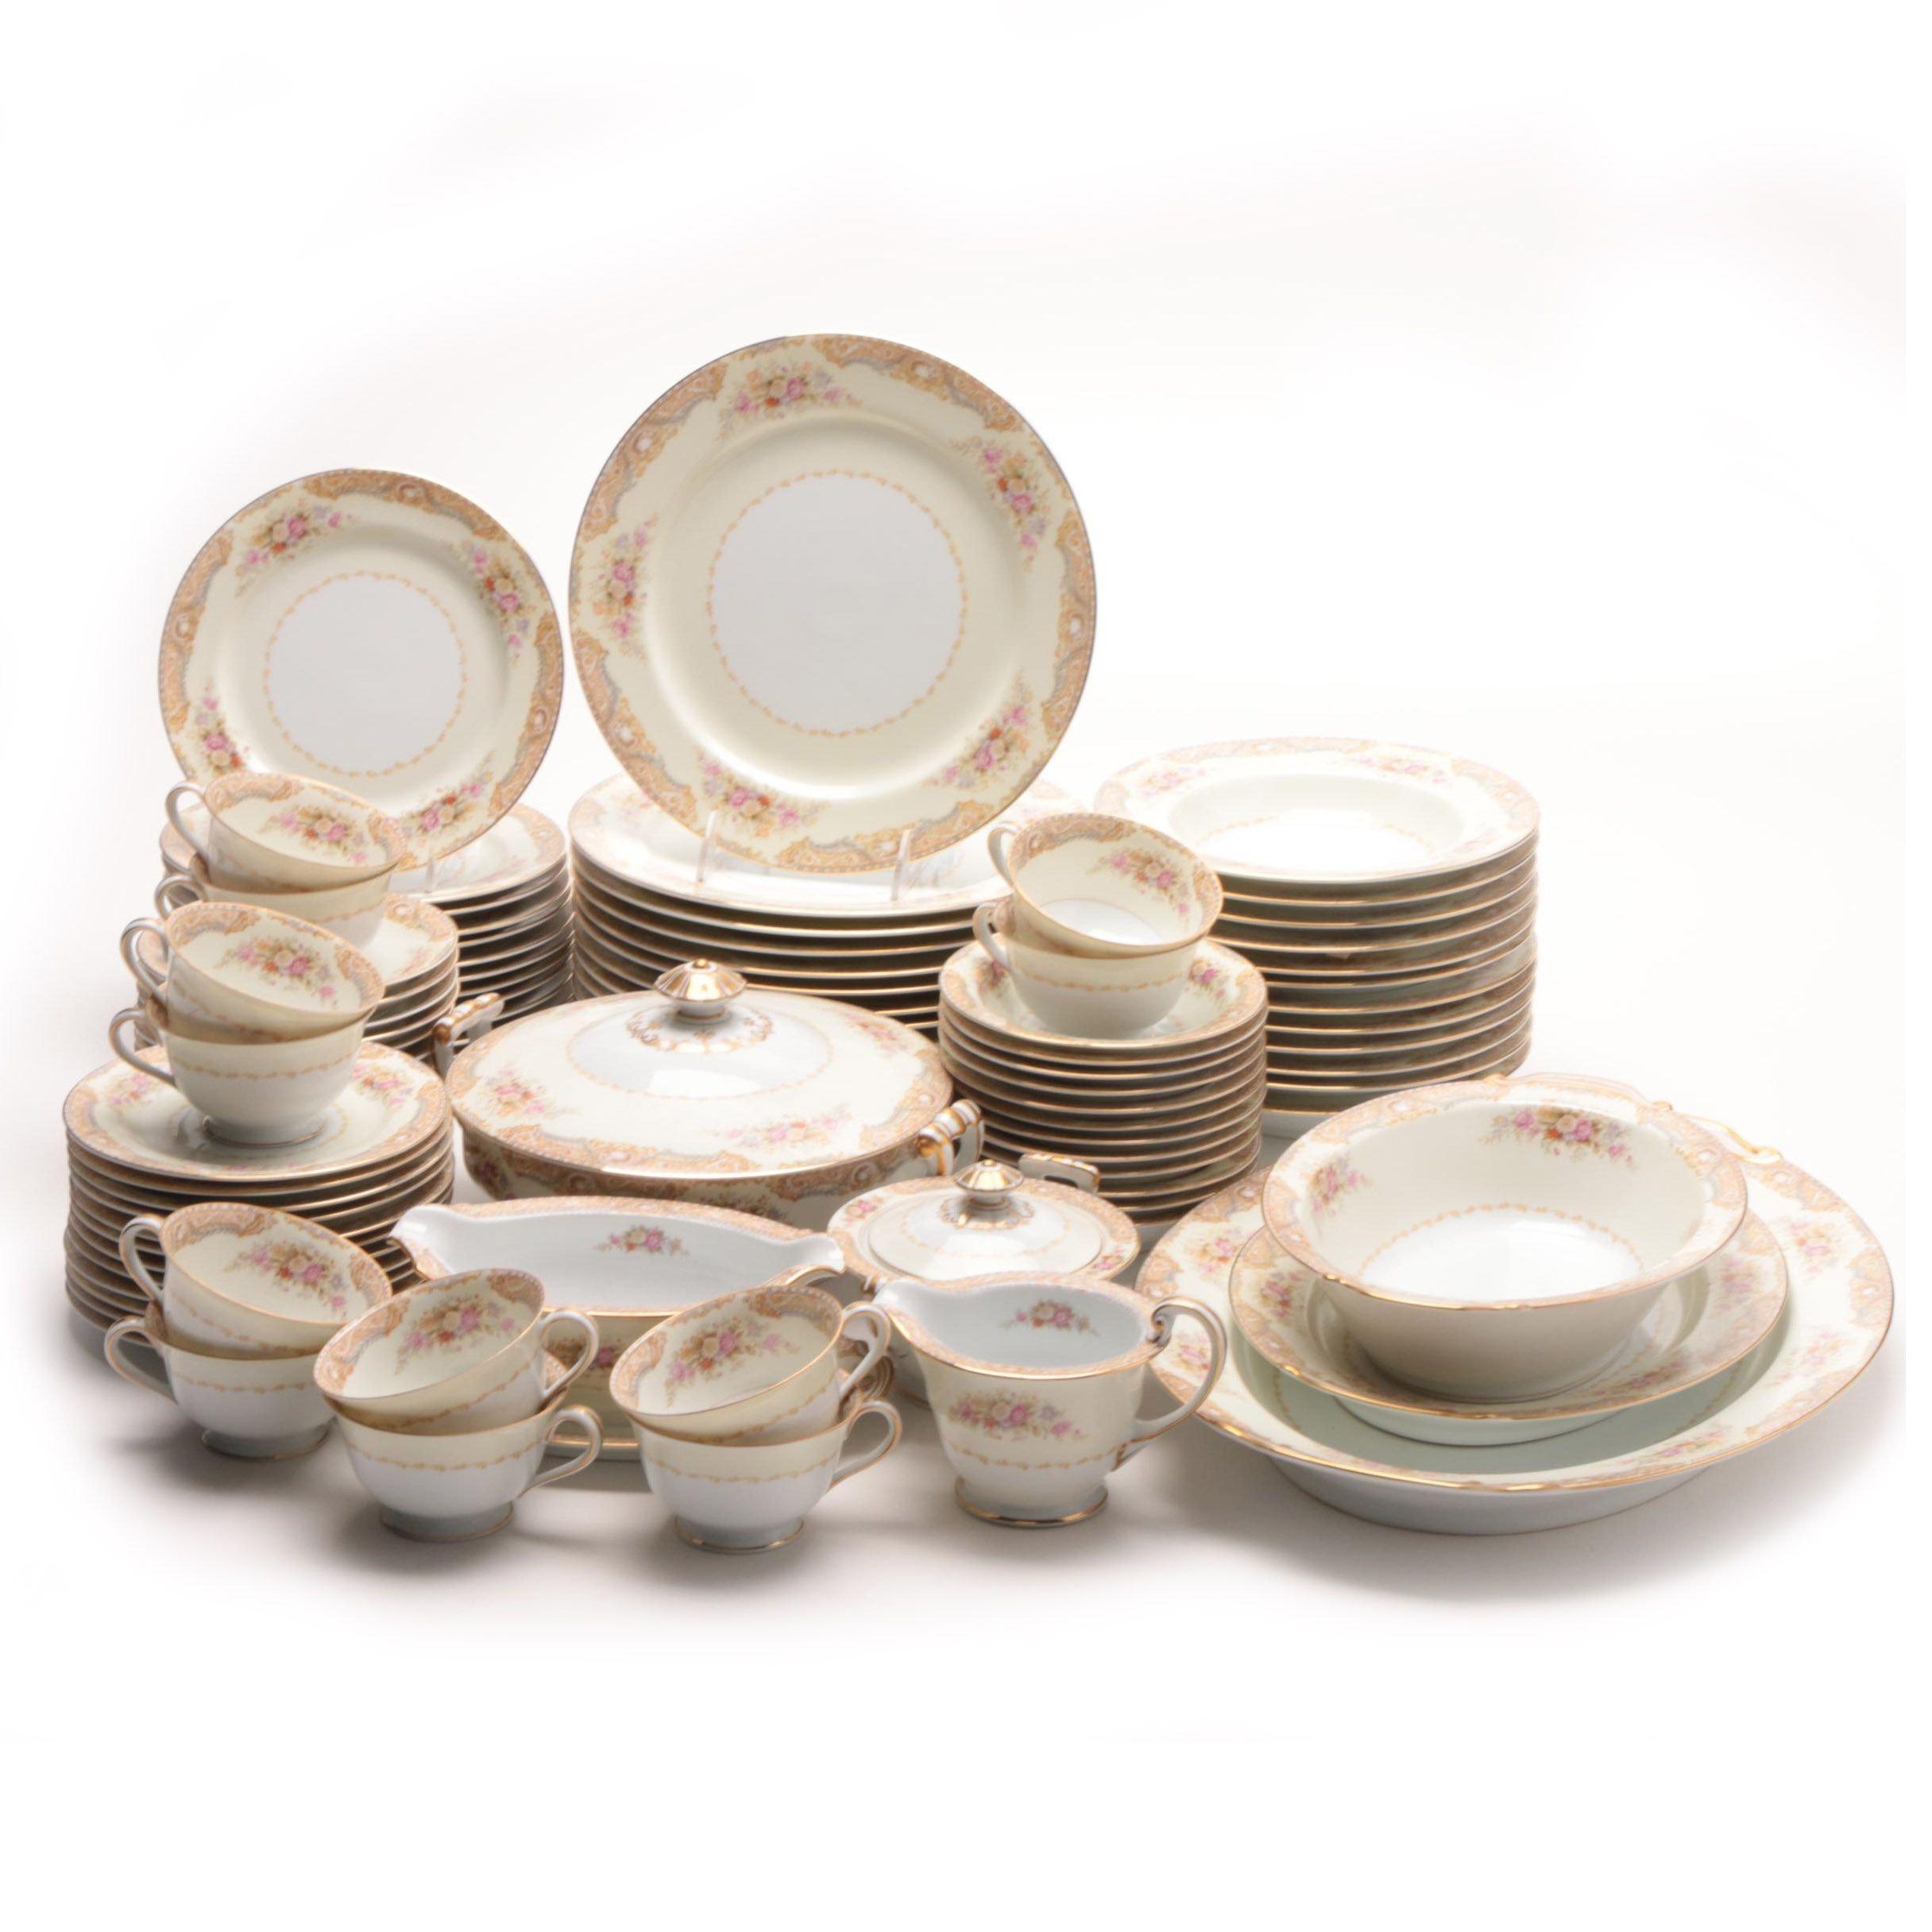 Set of Noritake Porcelain Dinnerware